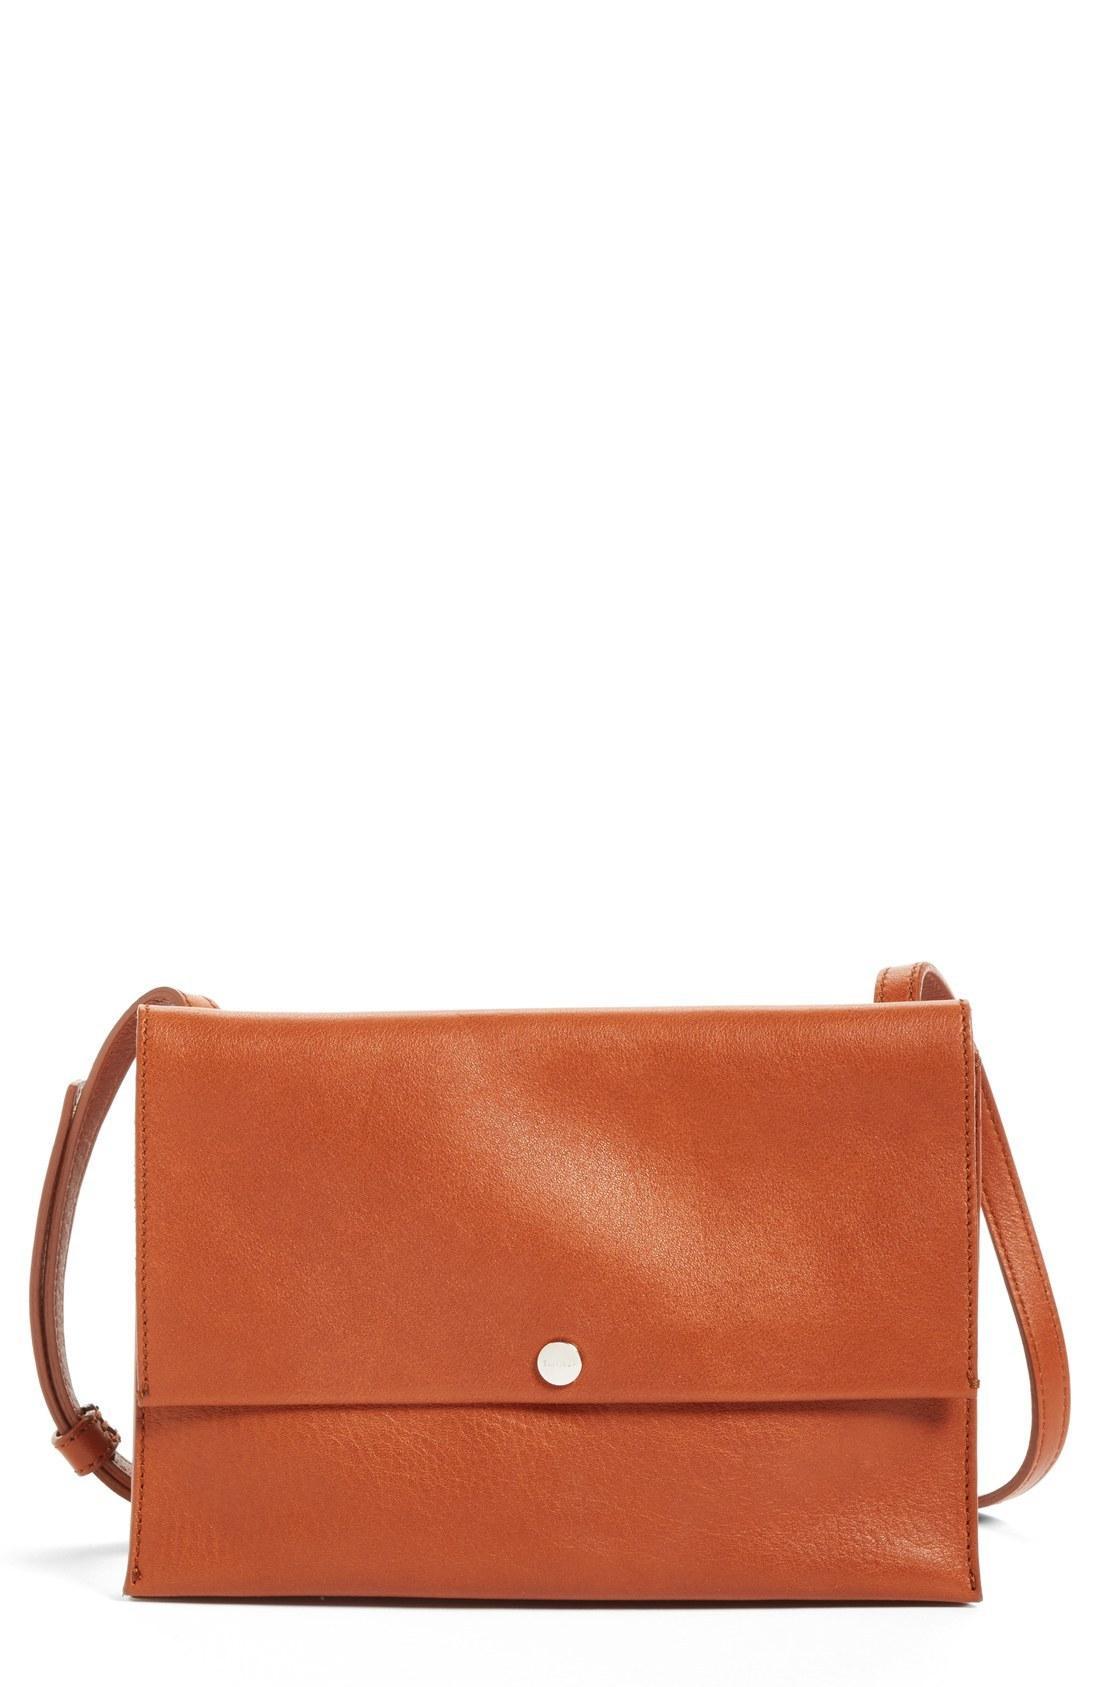 afecd98f4 Shinola Crossbody Leather Bag - Brown In Bourbon | ModeSens